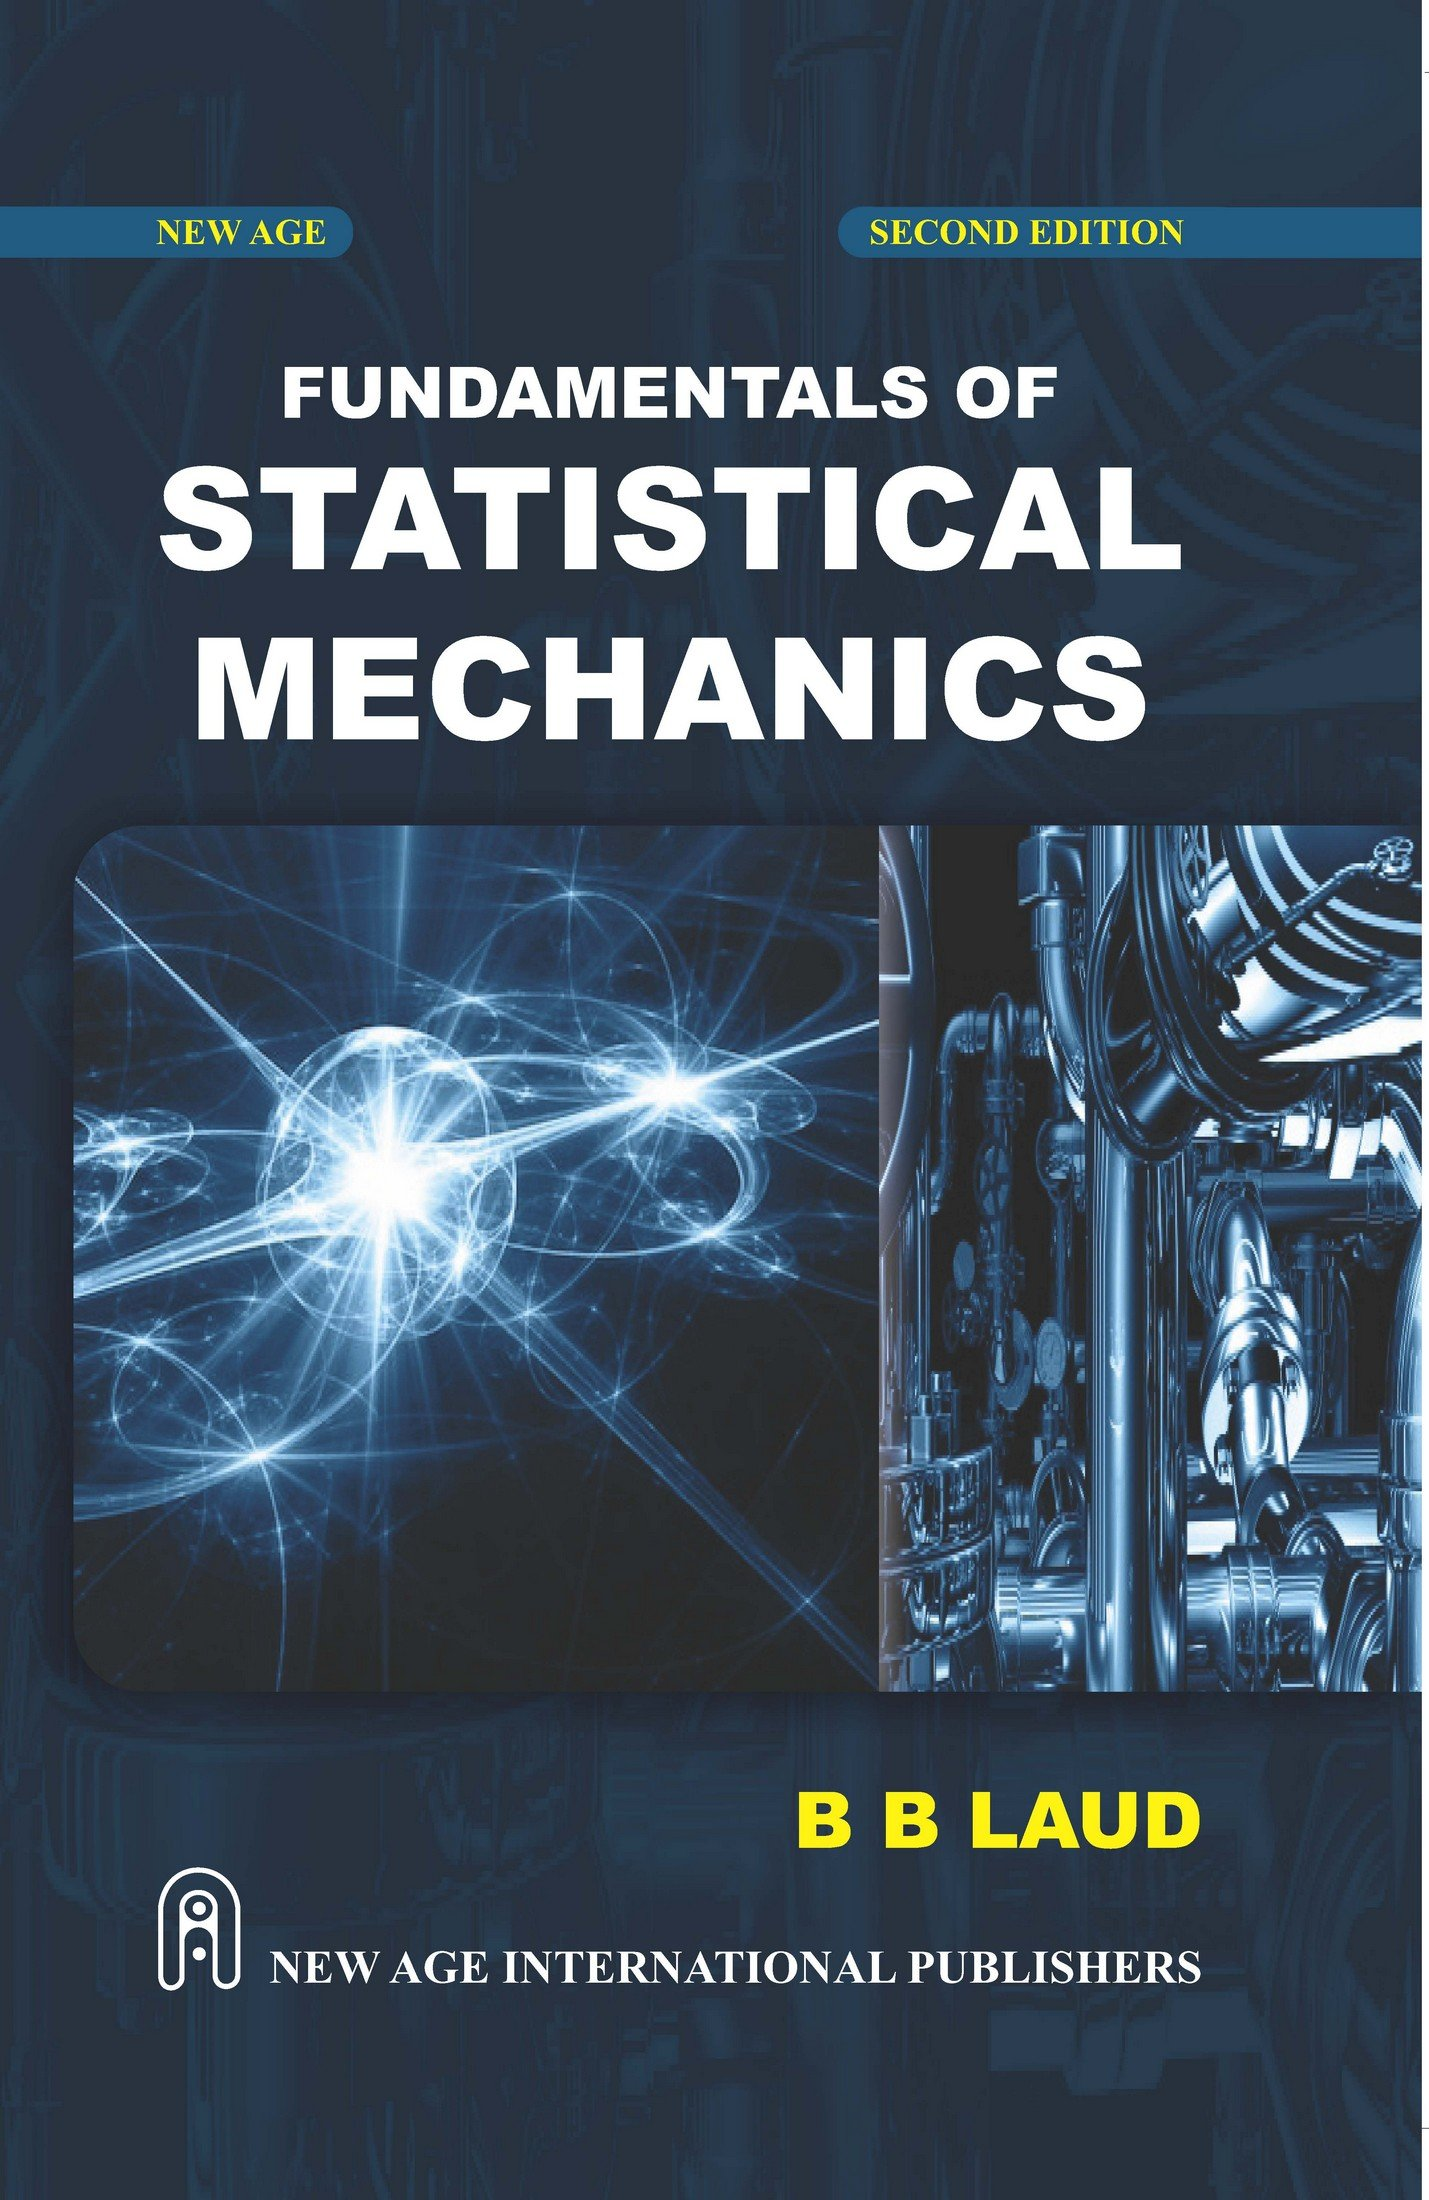 statistical mechanics by b b laud in